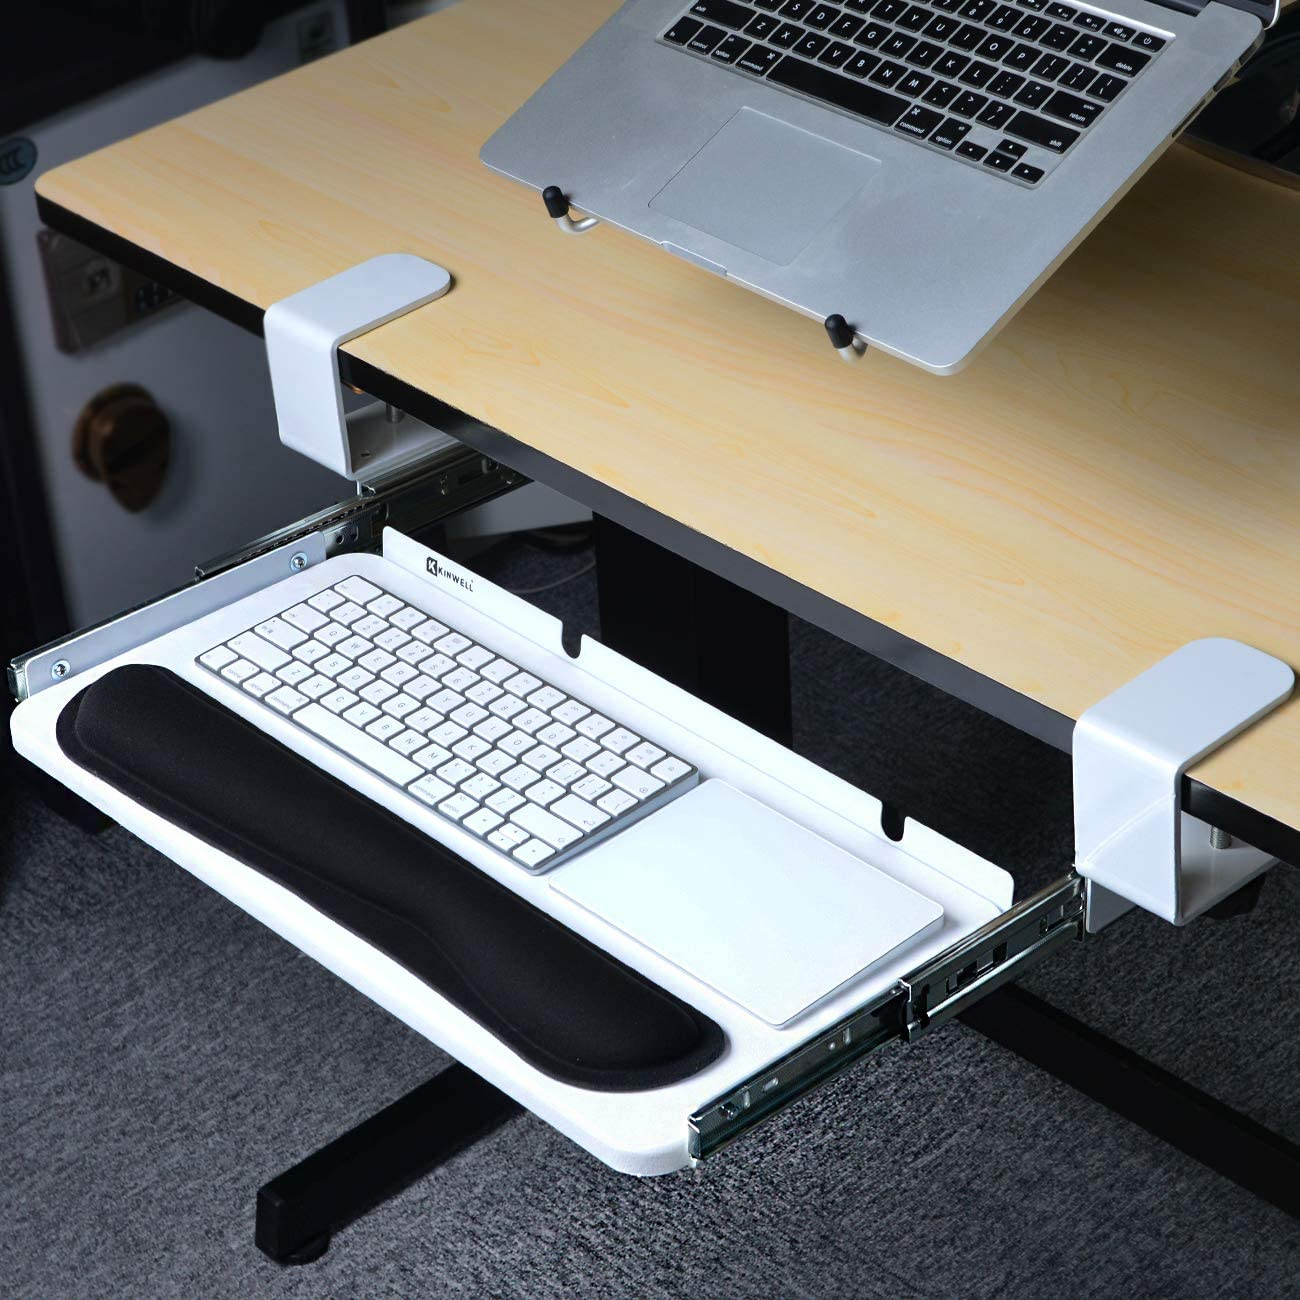 Beschan Ergonomics Under Table Keyboard Tray Super Easy Clamp on Mechanism Memory Foam Wrist Rest Straps White, 20 Inch